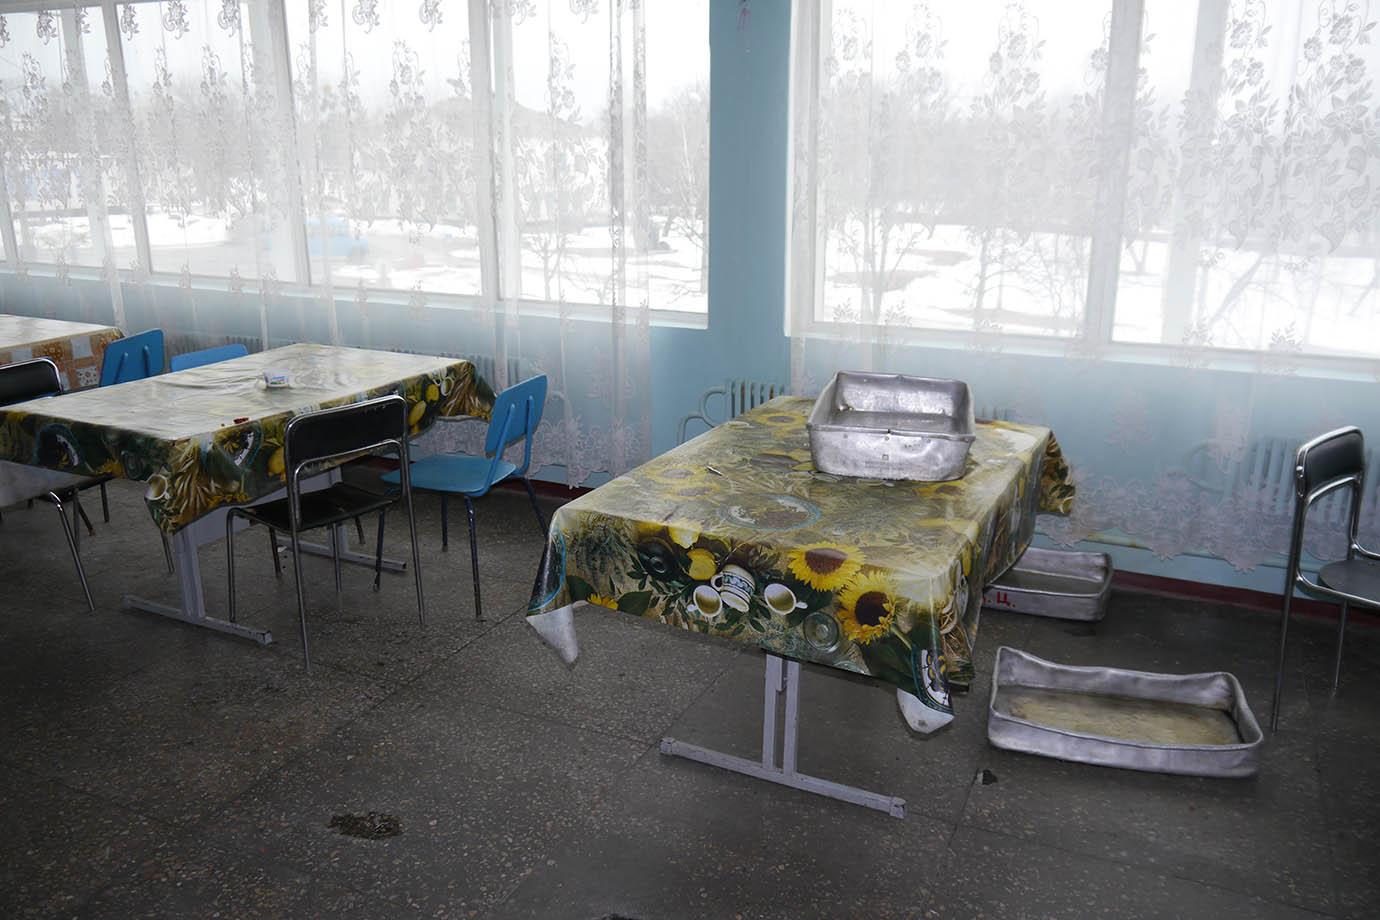 chernobyl-cafeteria33